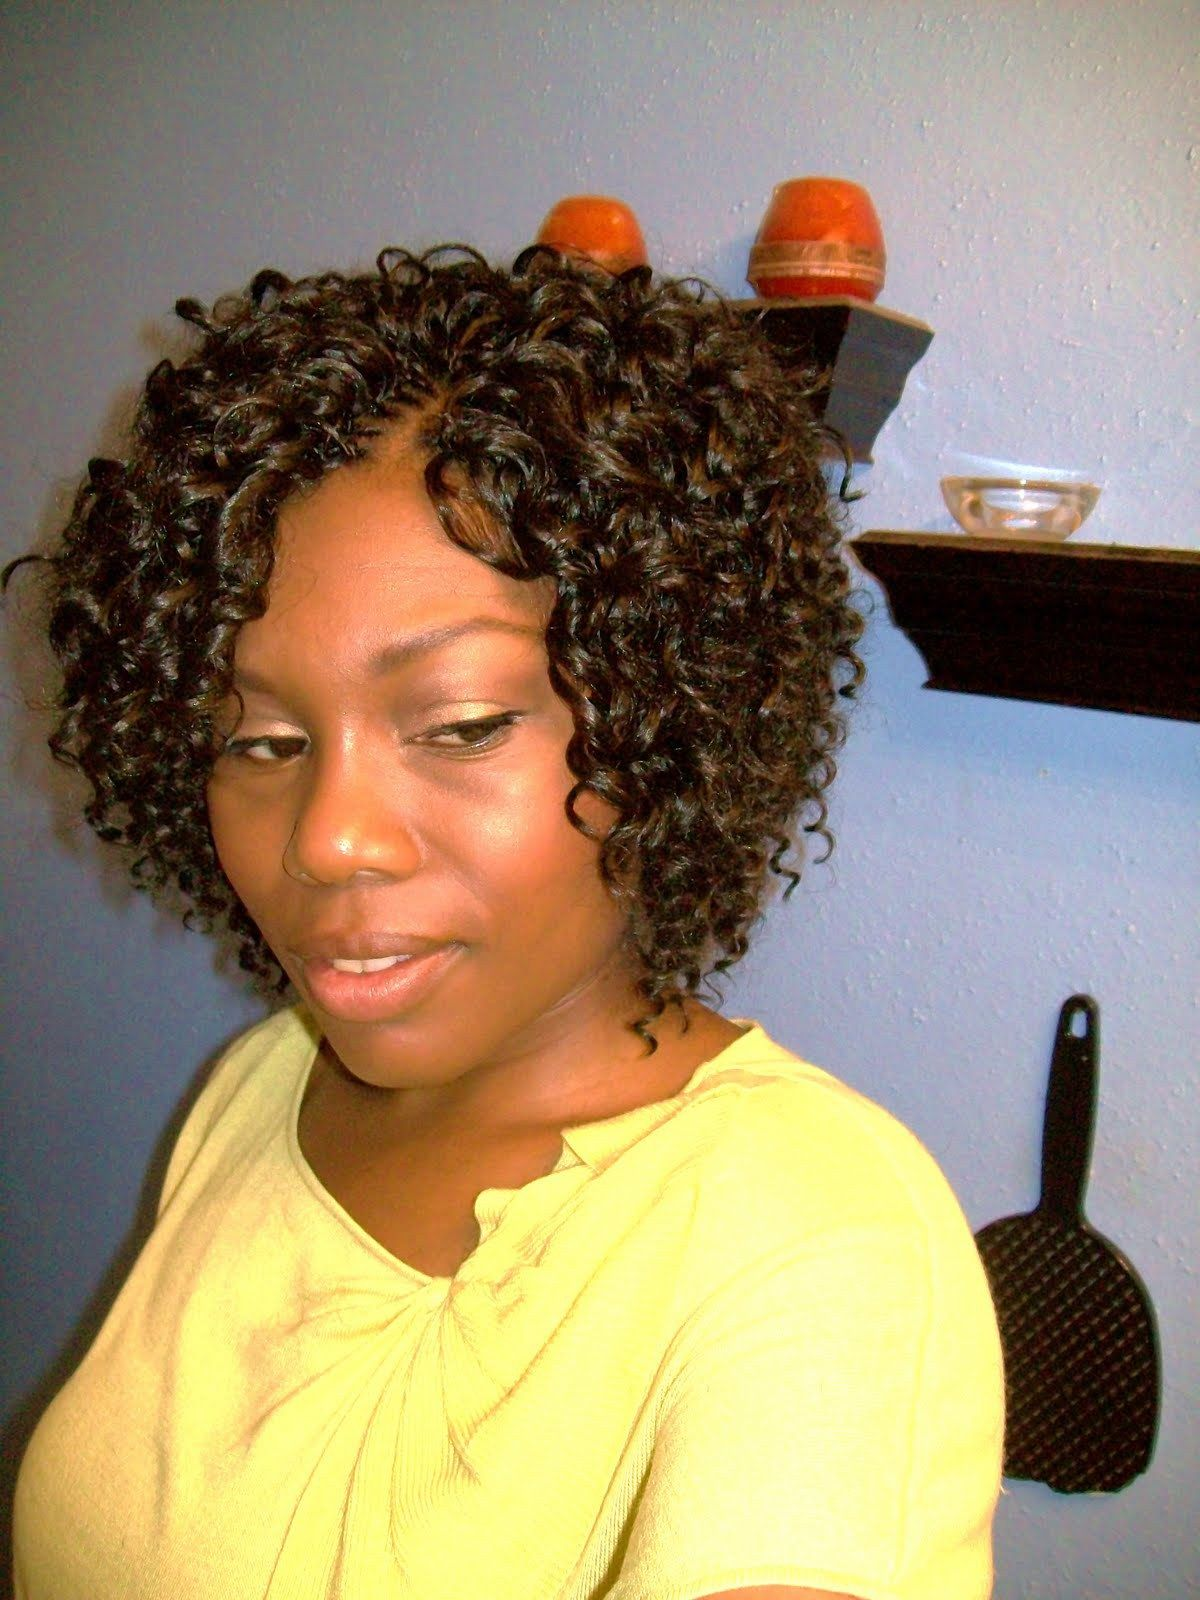 Very Short Crochet Braids Google Search Curly Crochet Hair Styles Short Crochet Braids Braids For Short Hair